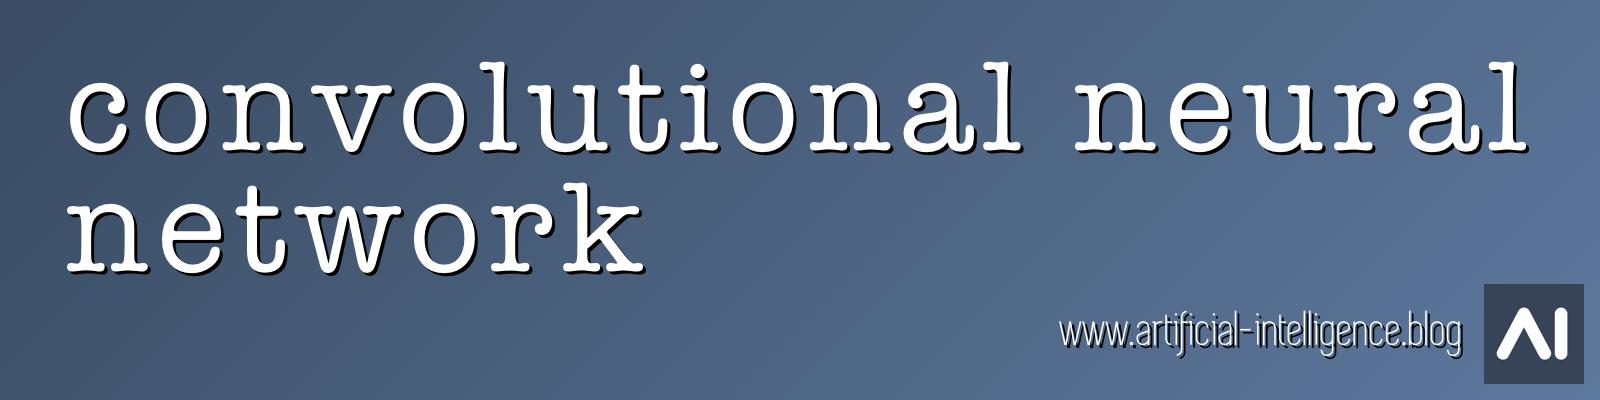 convolutional-neural-network.jpg